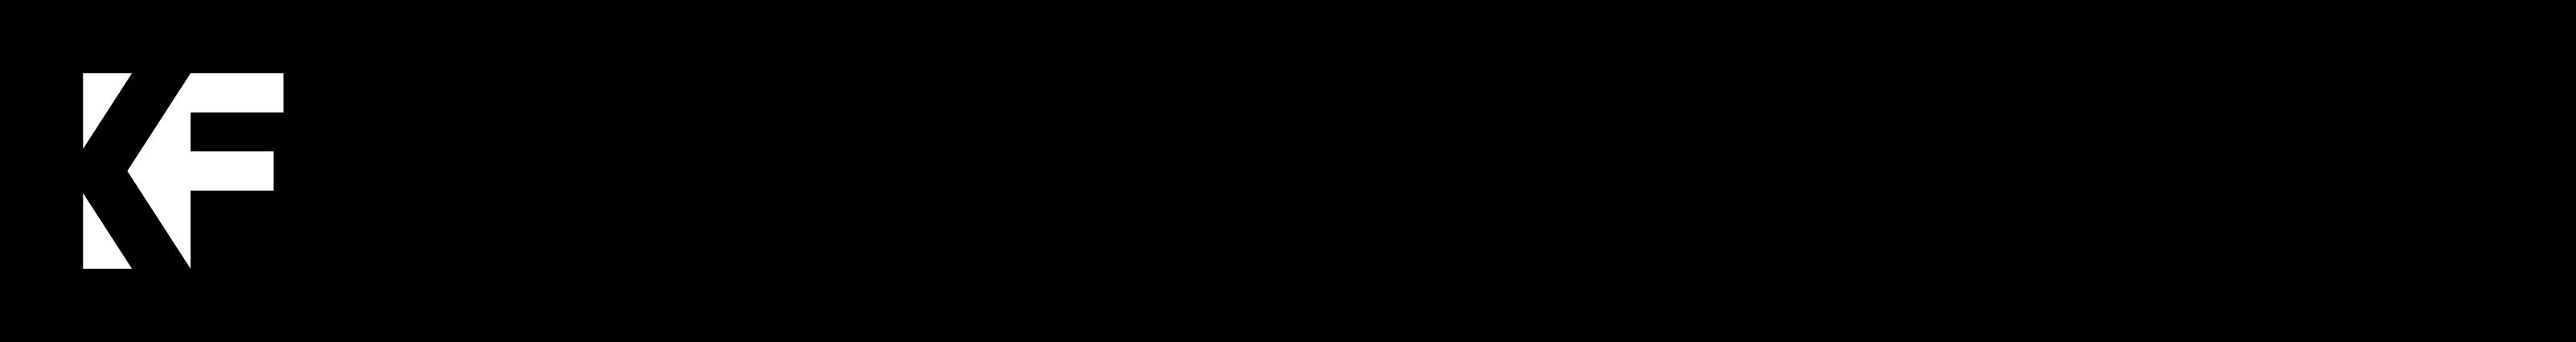 kf_logo-horizontal